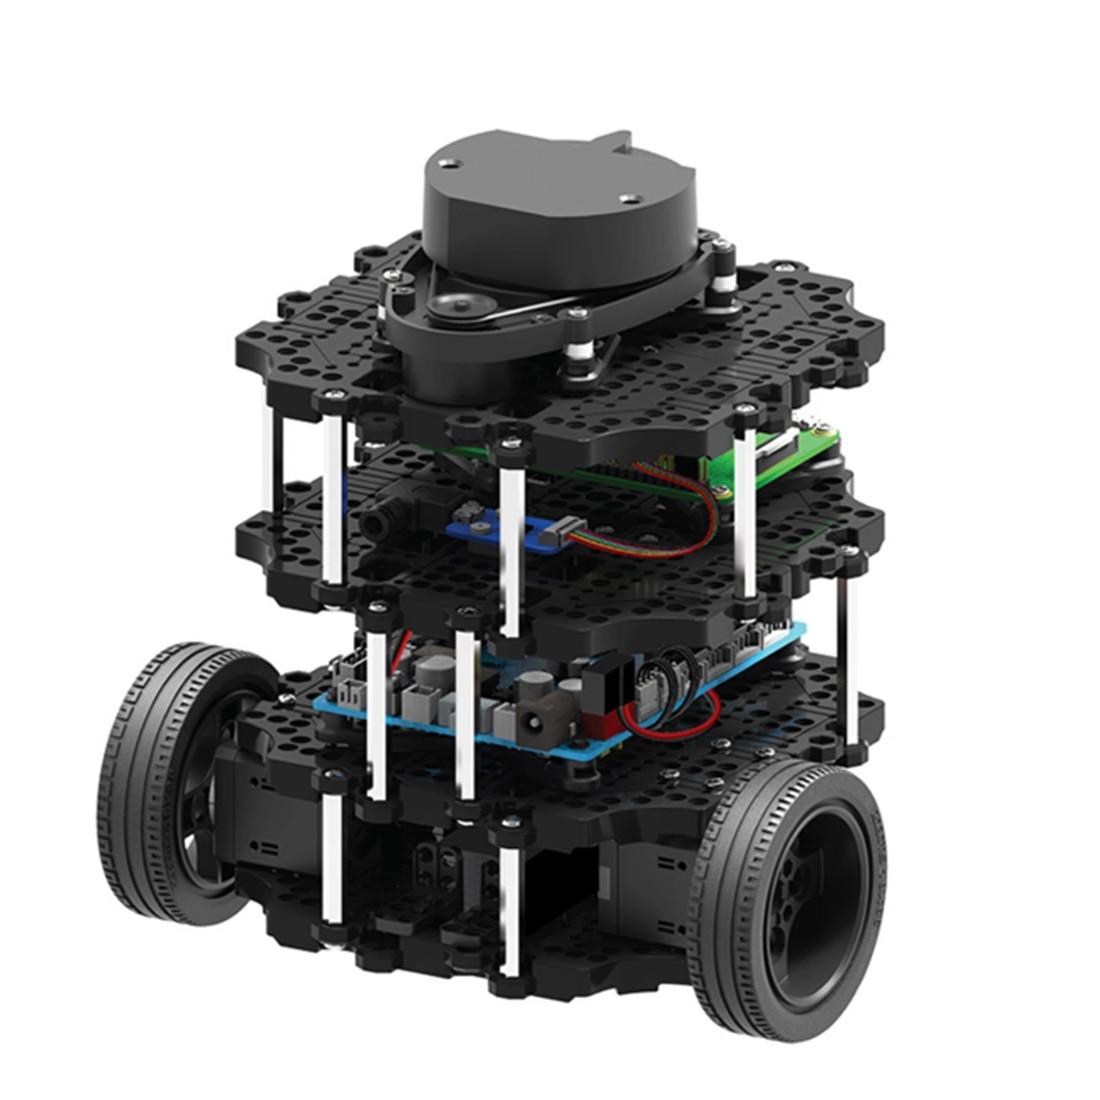 Programmable ROS Robot Automatic Navigation SLAM Car Turtlebot3-Burger Pi3 Kit/Bulk Parts Educational Toy Gift For Kids Adults